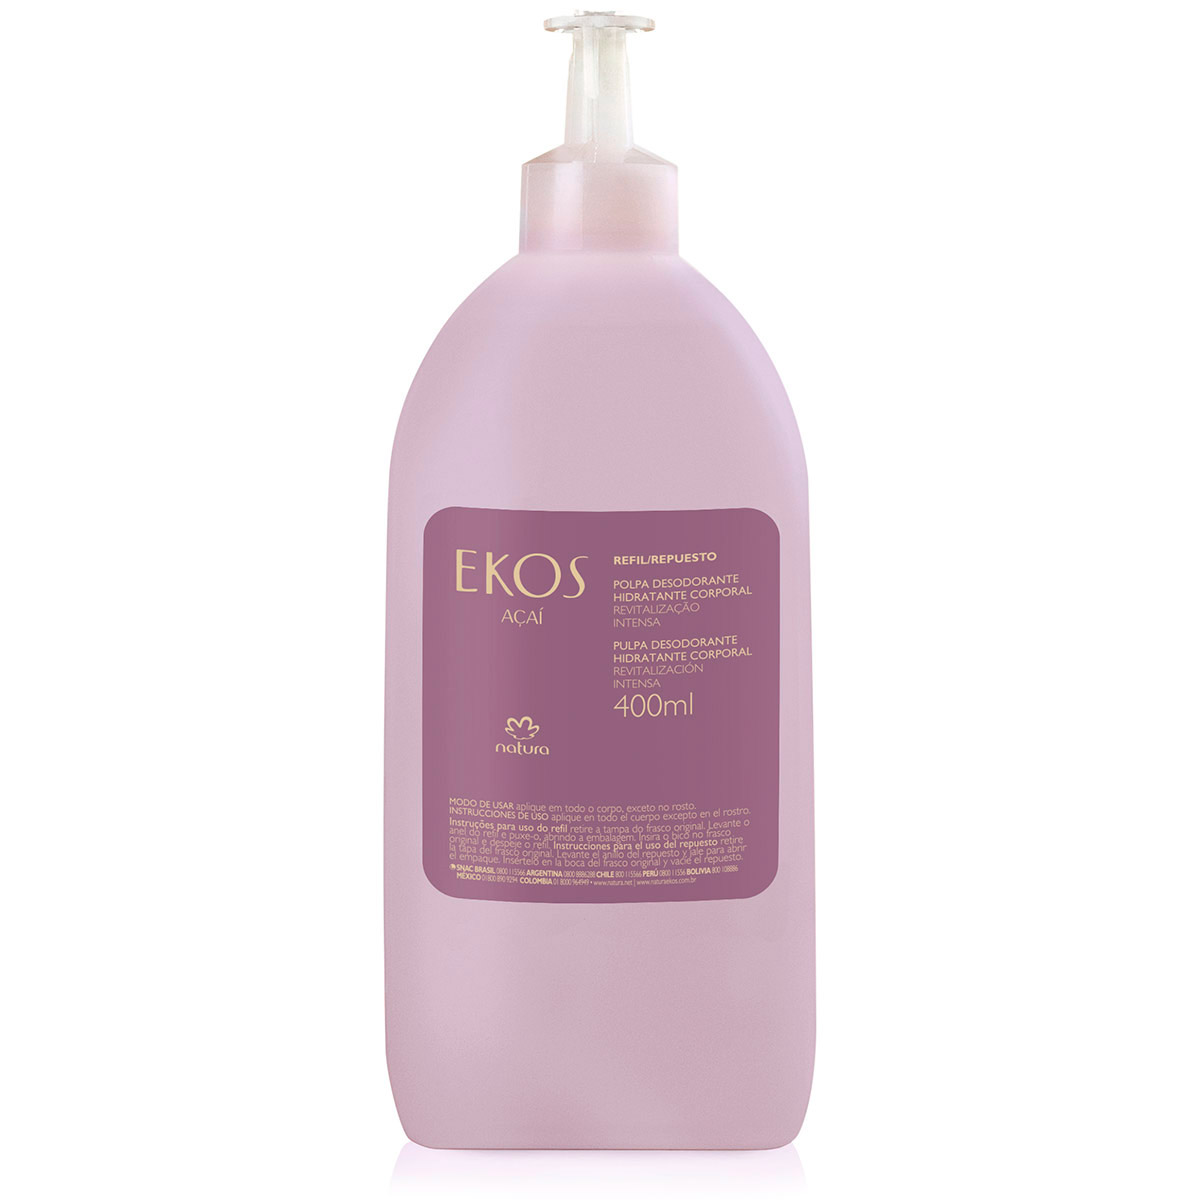 Refil Polpa Desodorante Hidratante para o Corpo Ekos Açaí - 400ml - 62532